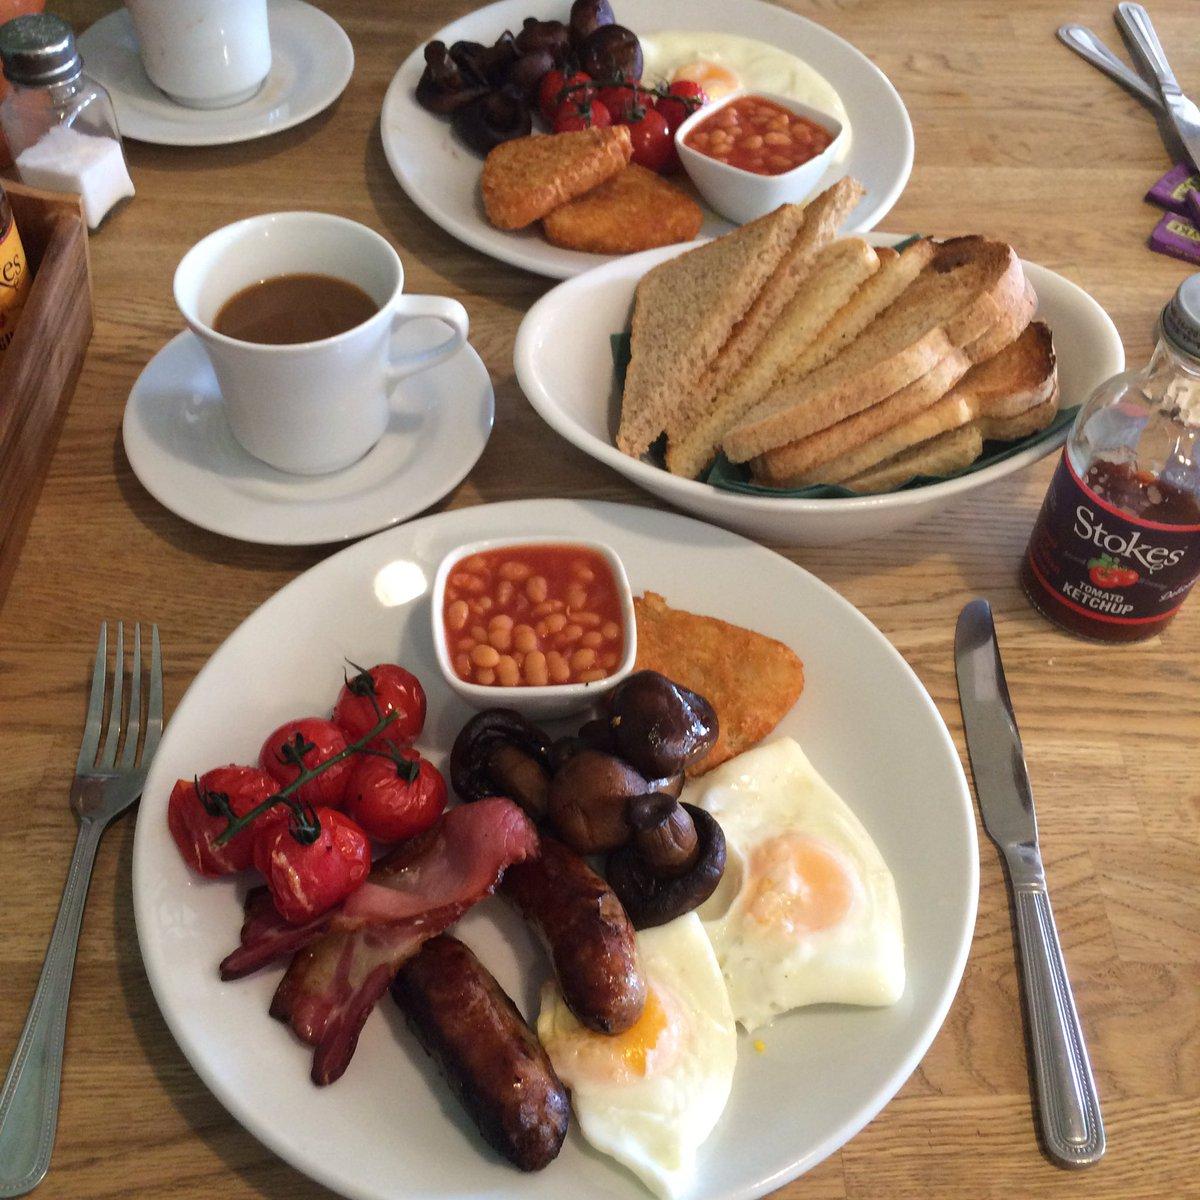 Gardeners Kitchen Fry Up Inspector On Twitter Breakfast At Gardeners Kitchen